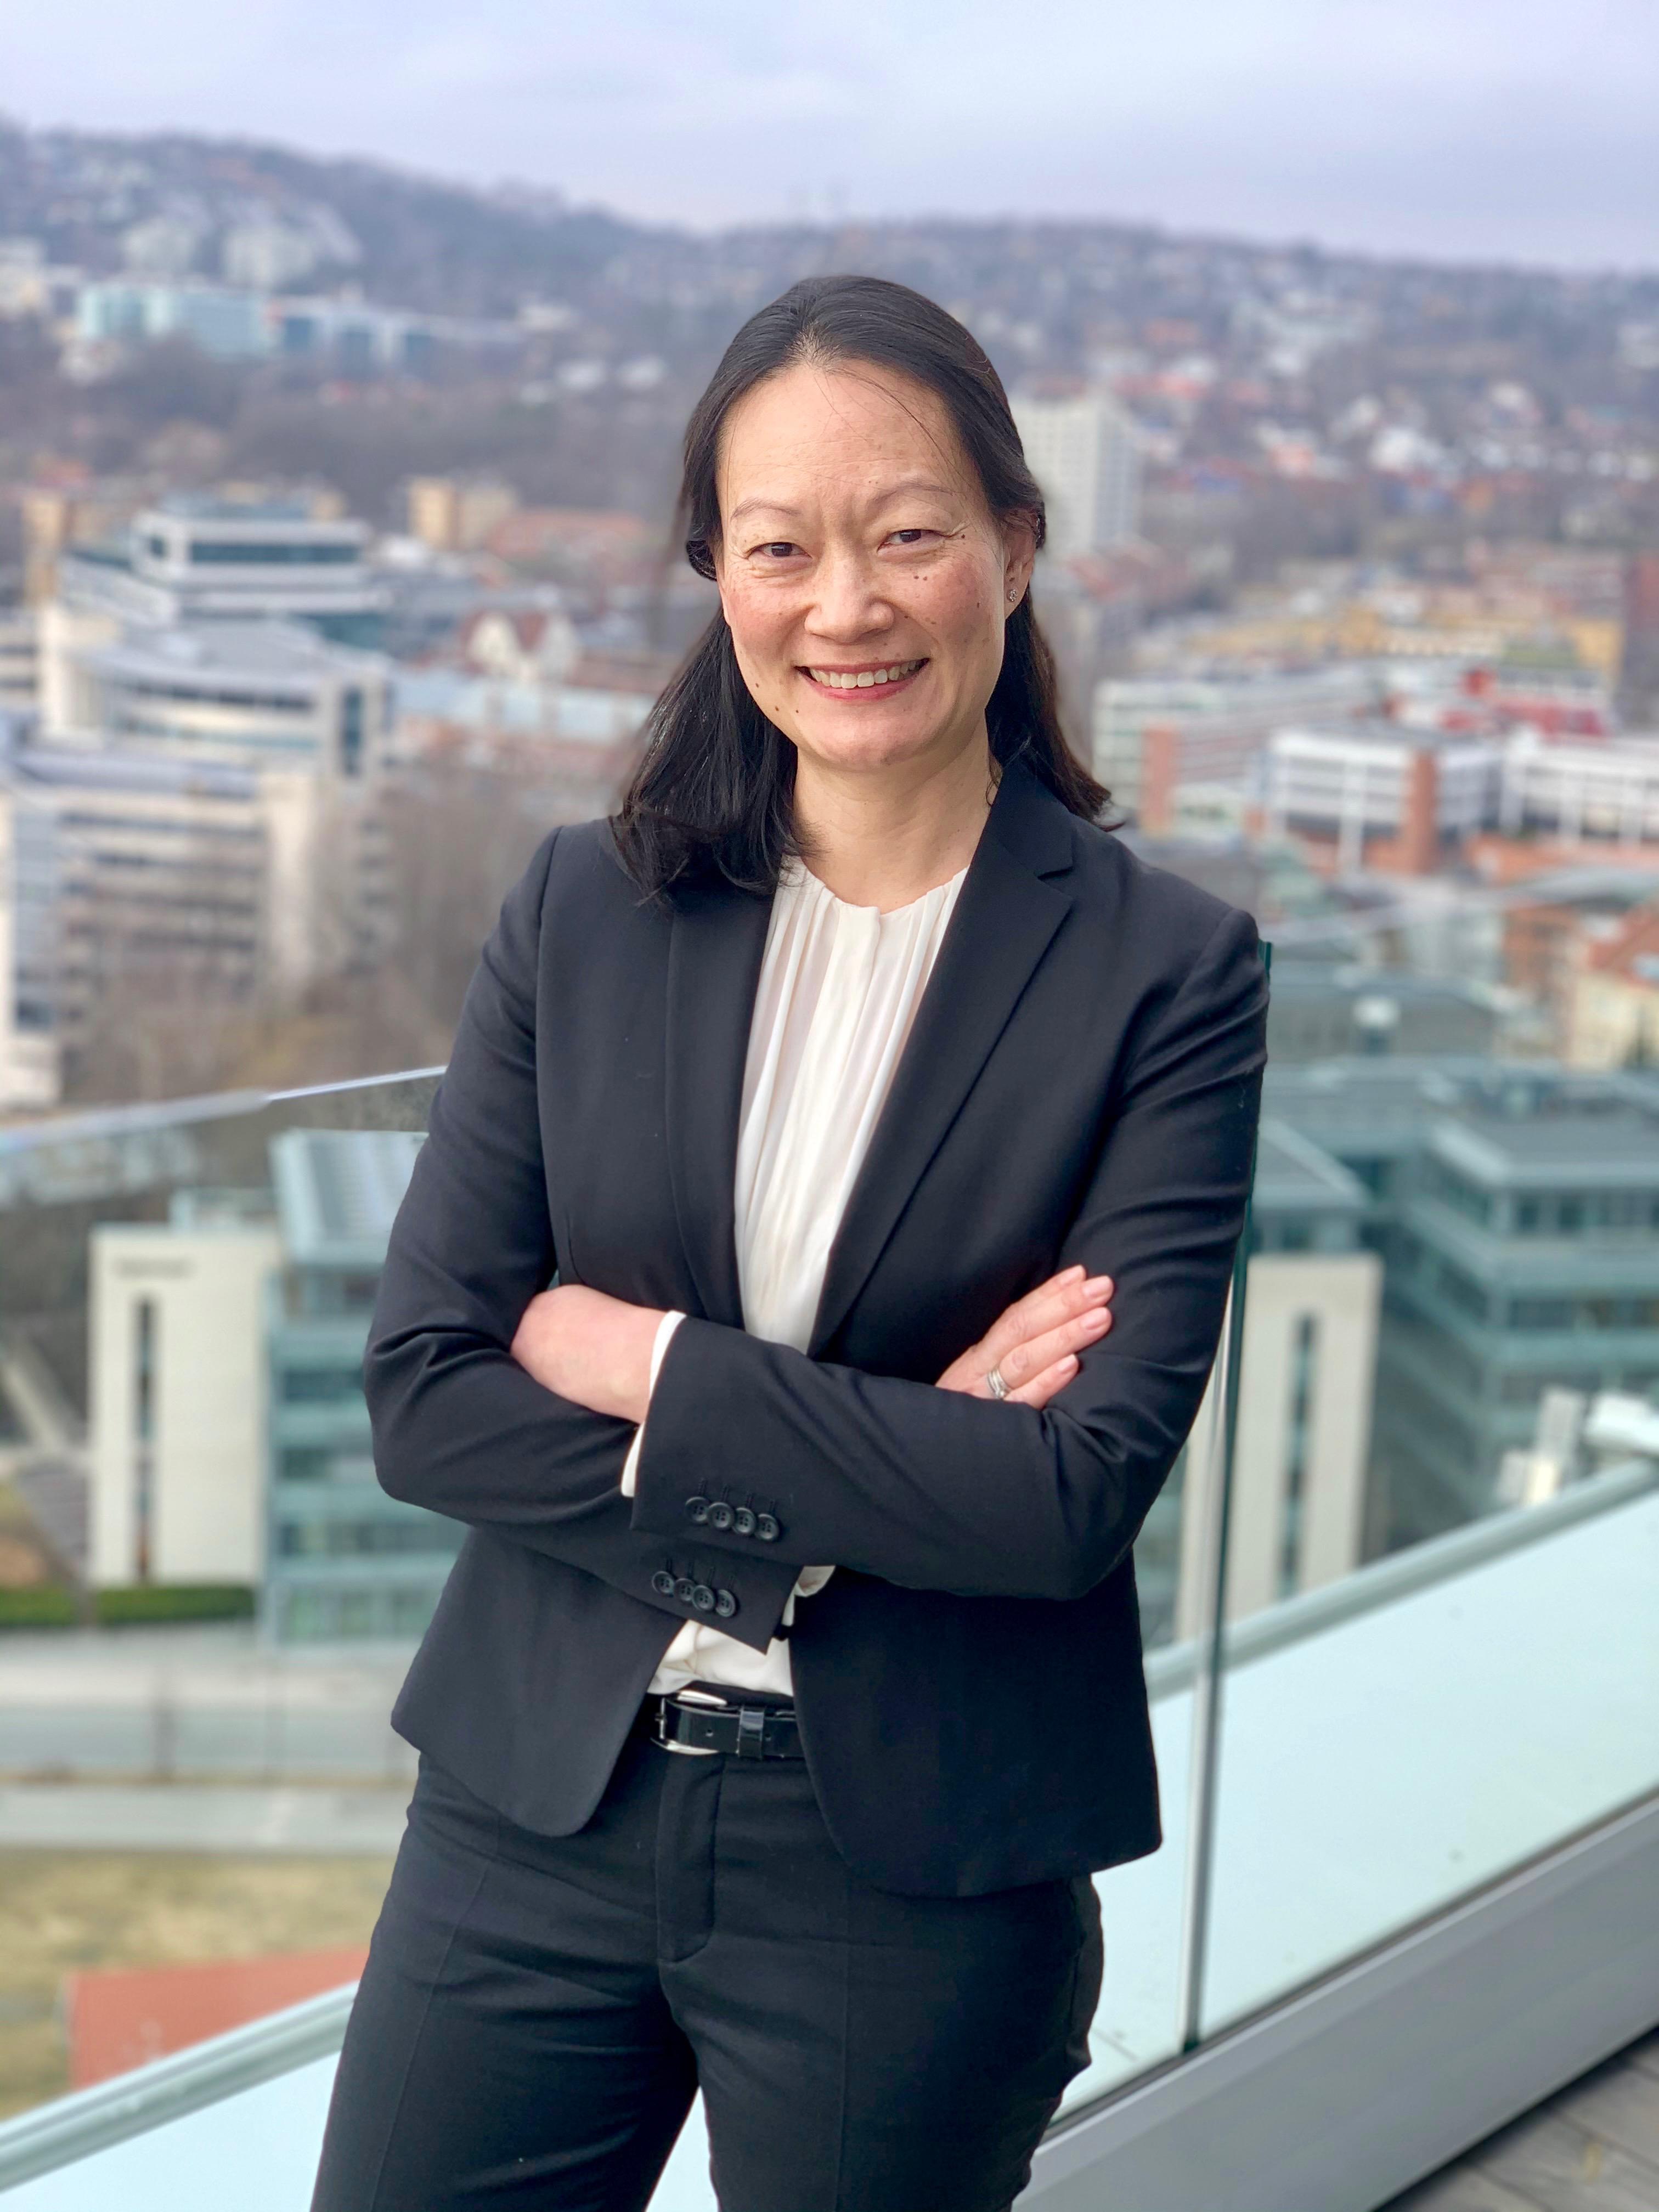 Ny leder for Investor Relations i Orkla